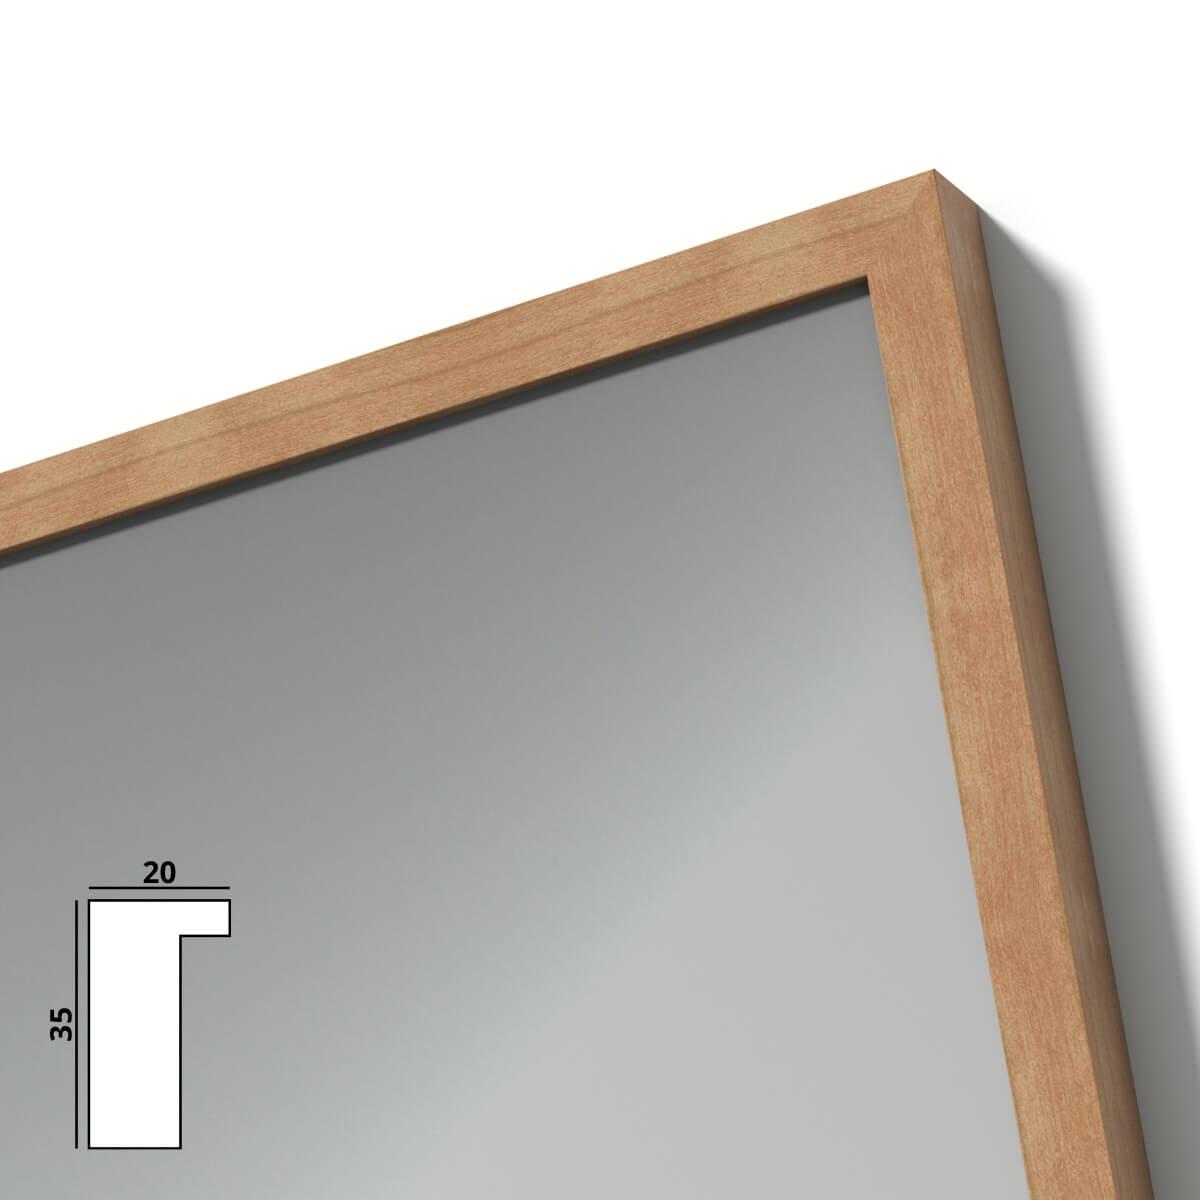 spiegel mit holzrahmen nach ma mosel 989709723. Black Bedroom Furniture Sets. Home Design Ideas